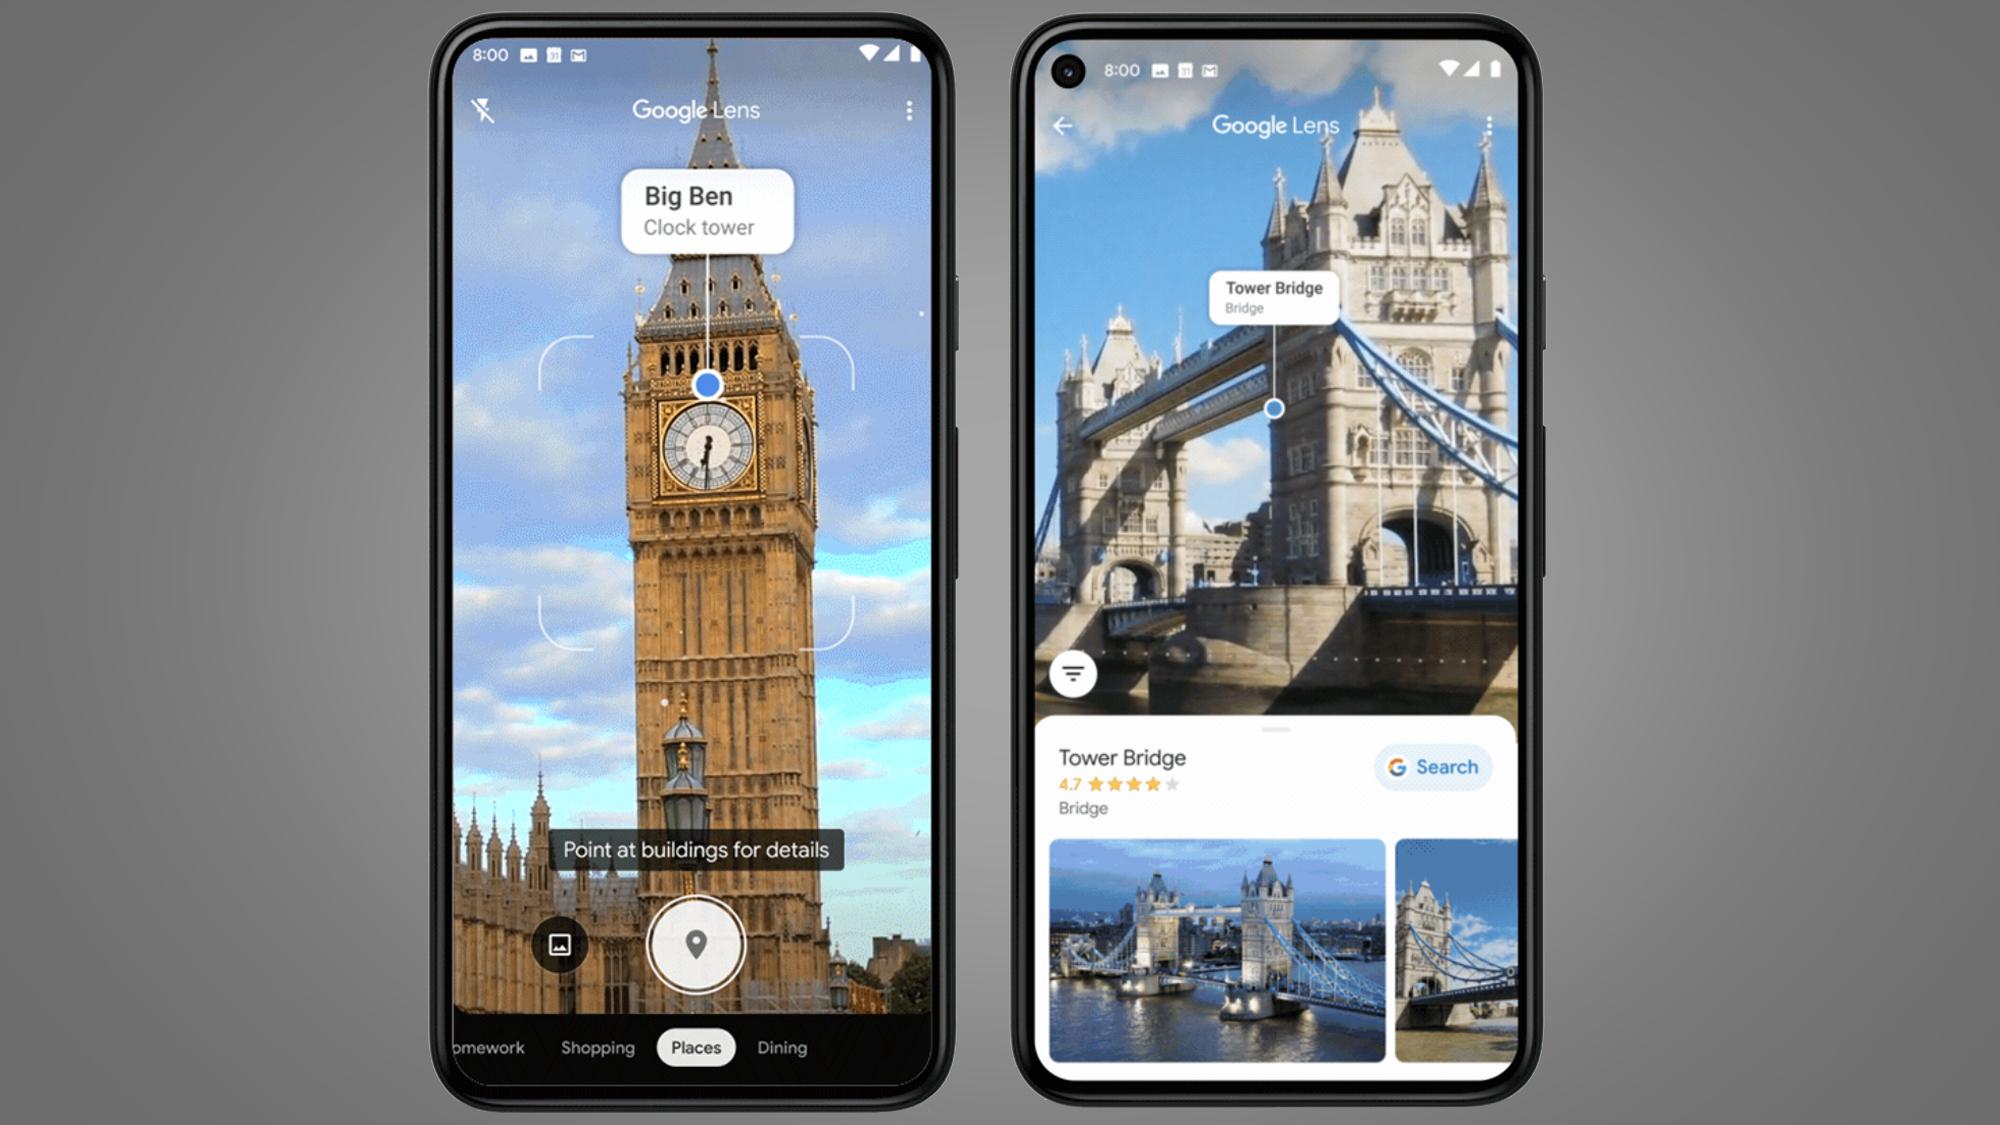 Google Lens Places filter